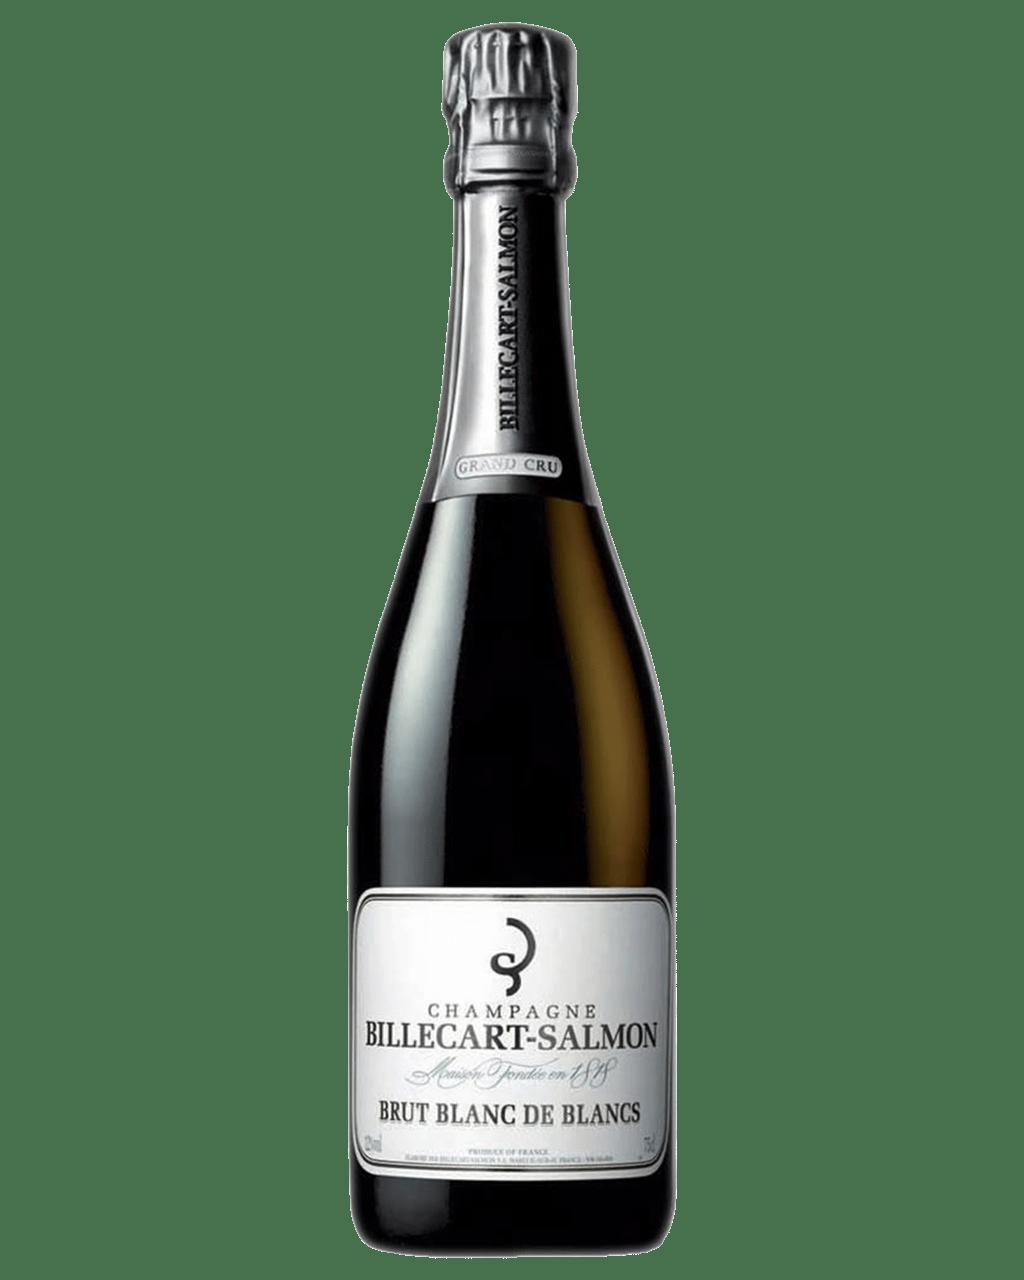 7714825886b4 Billecart-Salmon Brut Blanc de Blanc. product image